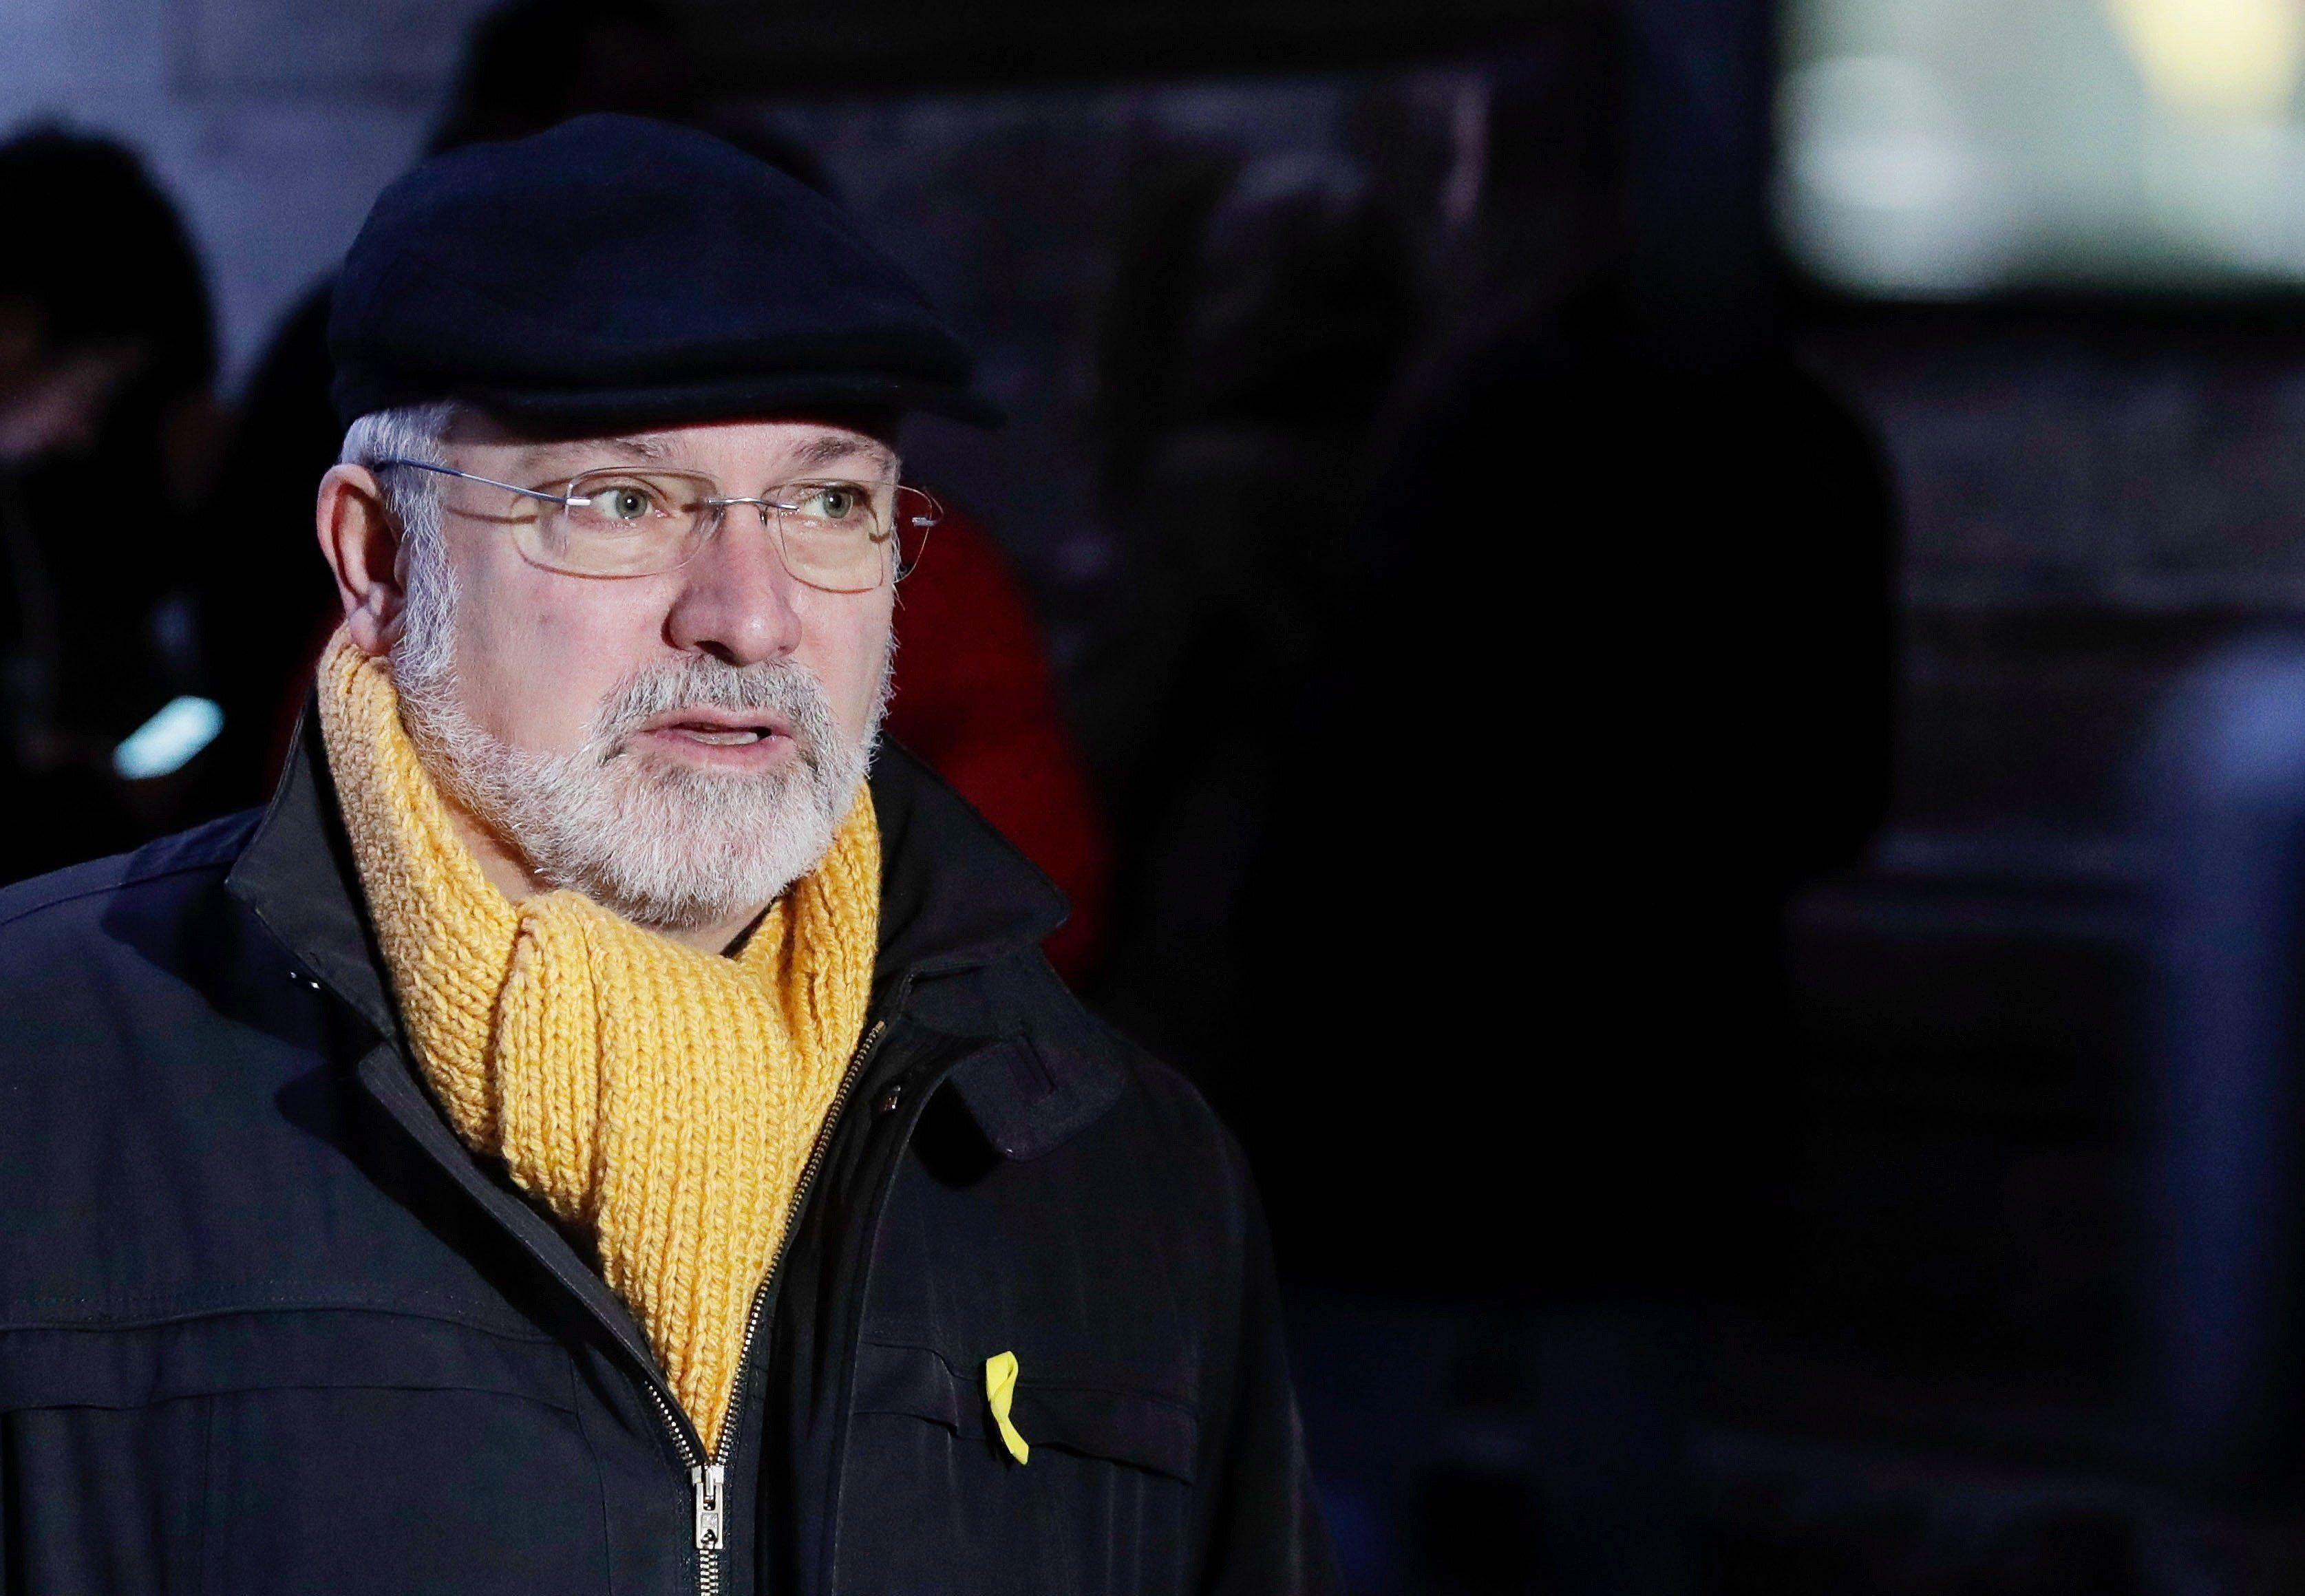 La Justicia belga decide hoy sobre la entrega del ex consejero Lluís Puig. EFE/EPA/STEPHANIE LECOCQ/Archivo